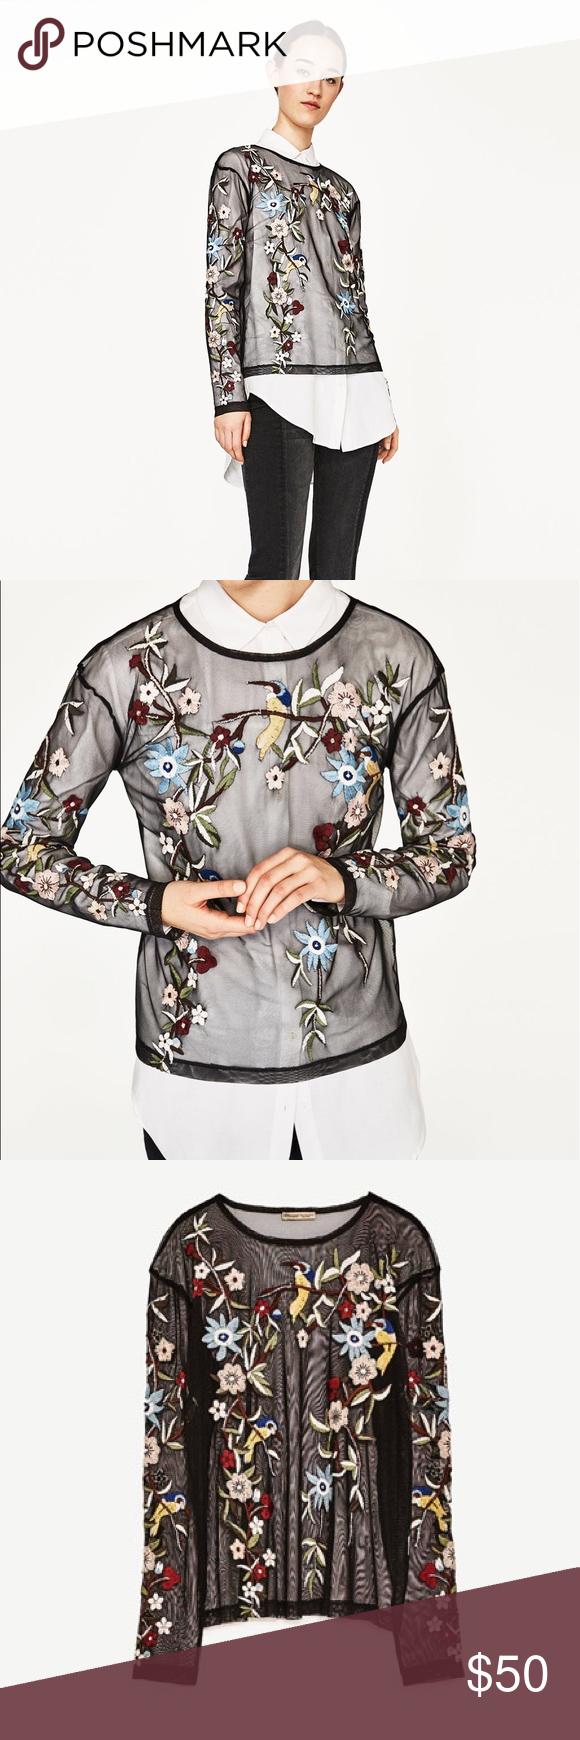 ZARA embroidered tulle top Beautiful brand new ZARA